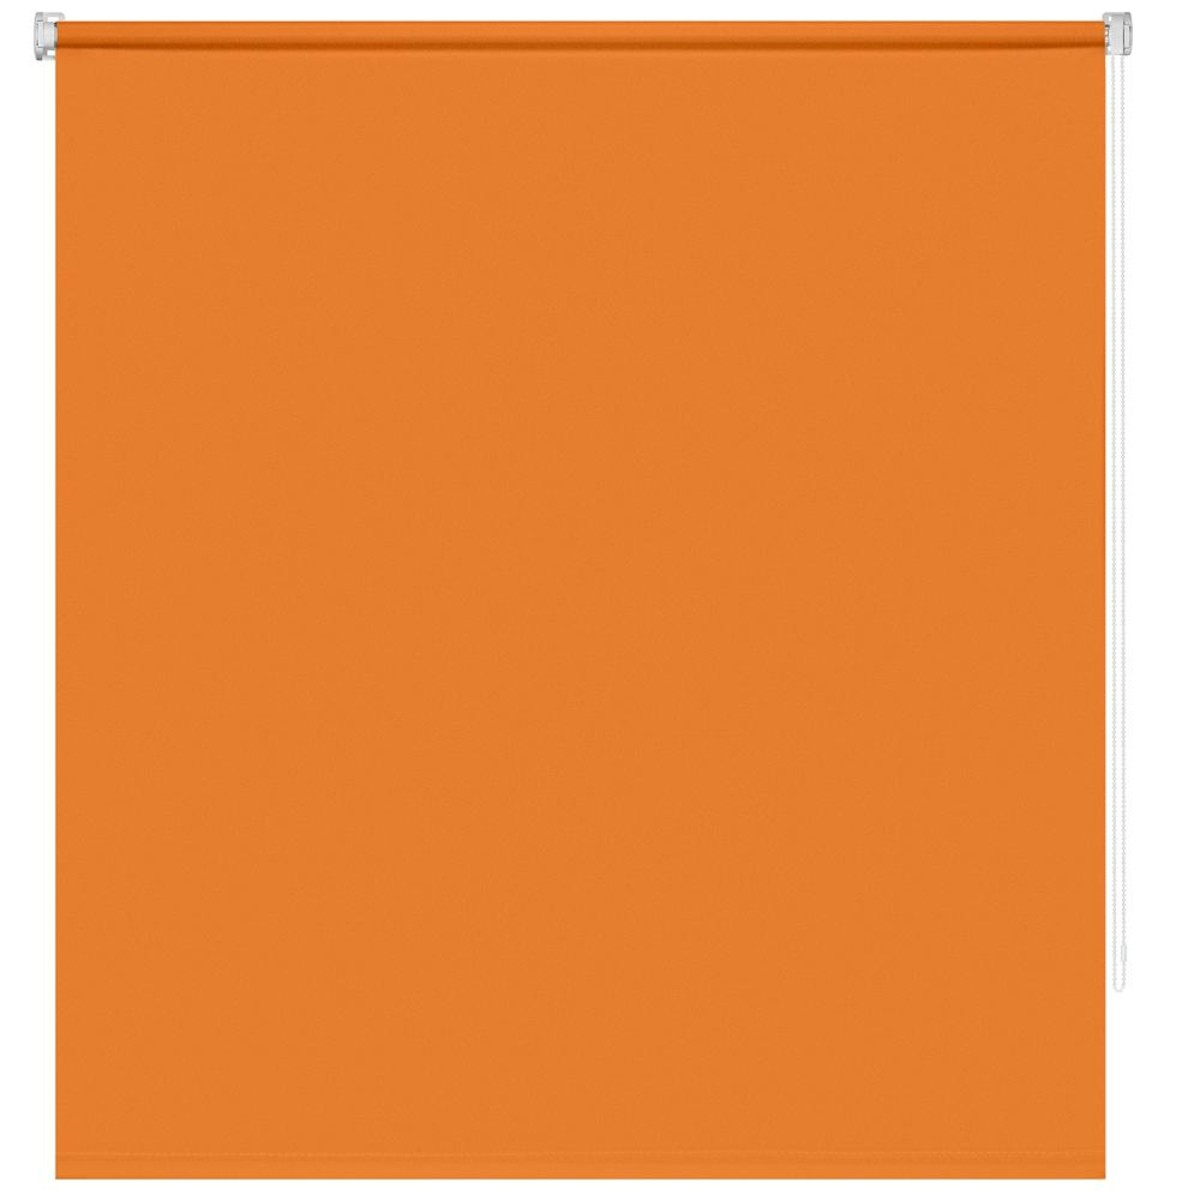 Рулонная Ора Decofest Плайн 120Х160 Цвет Оранжевый